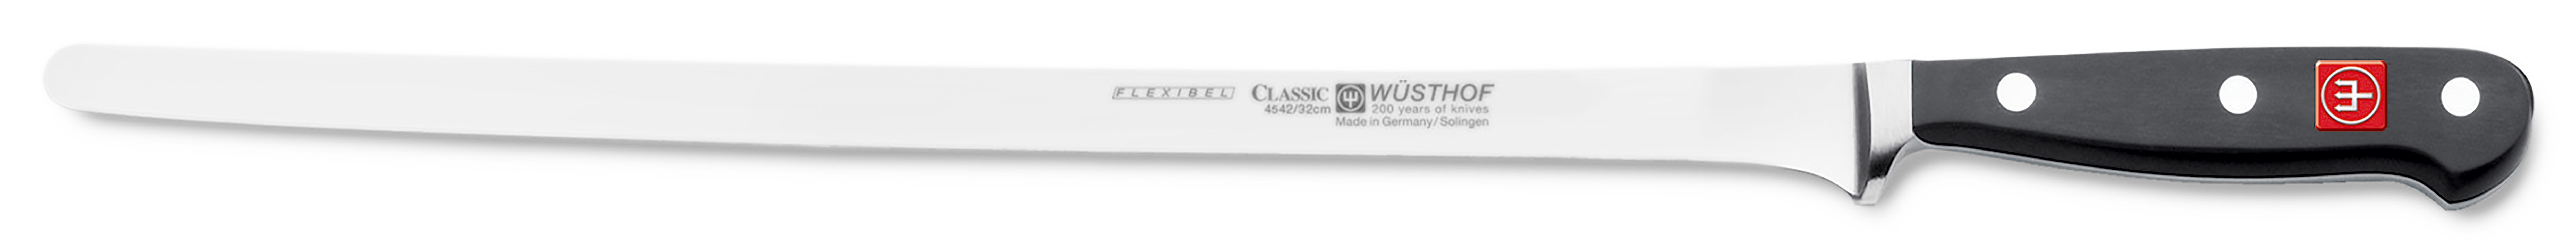 Wüsthof CLASSIC Lachsmesser 32cm